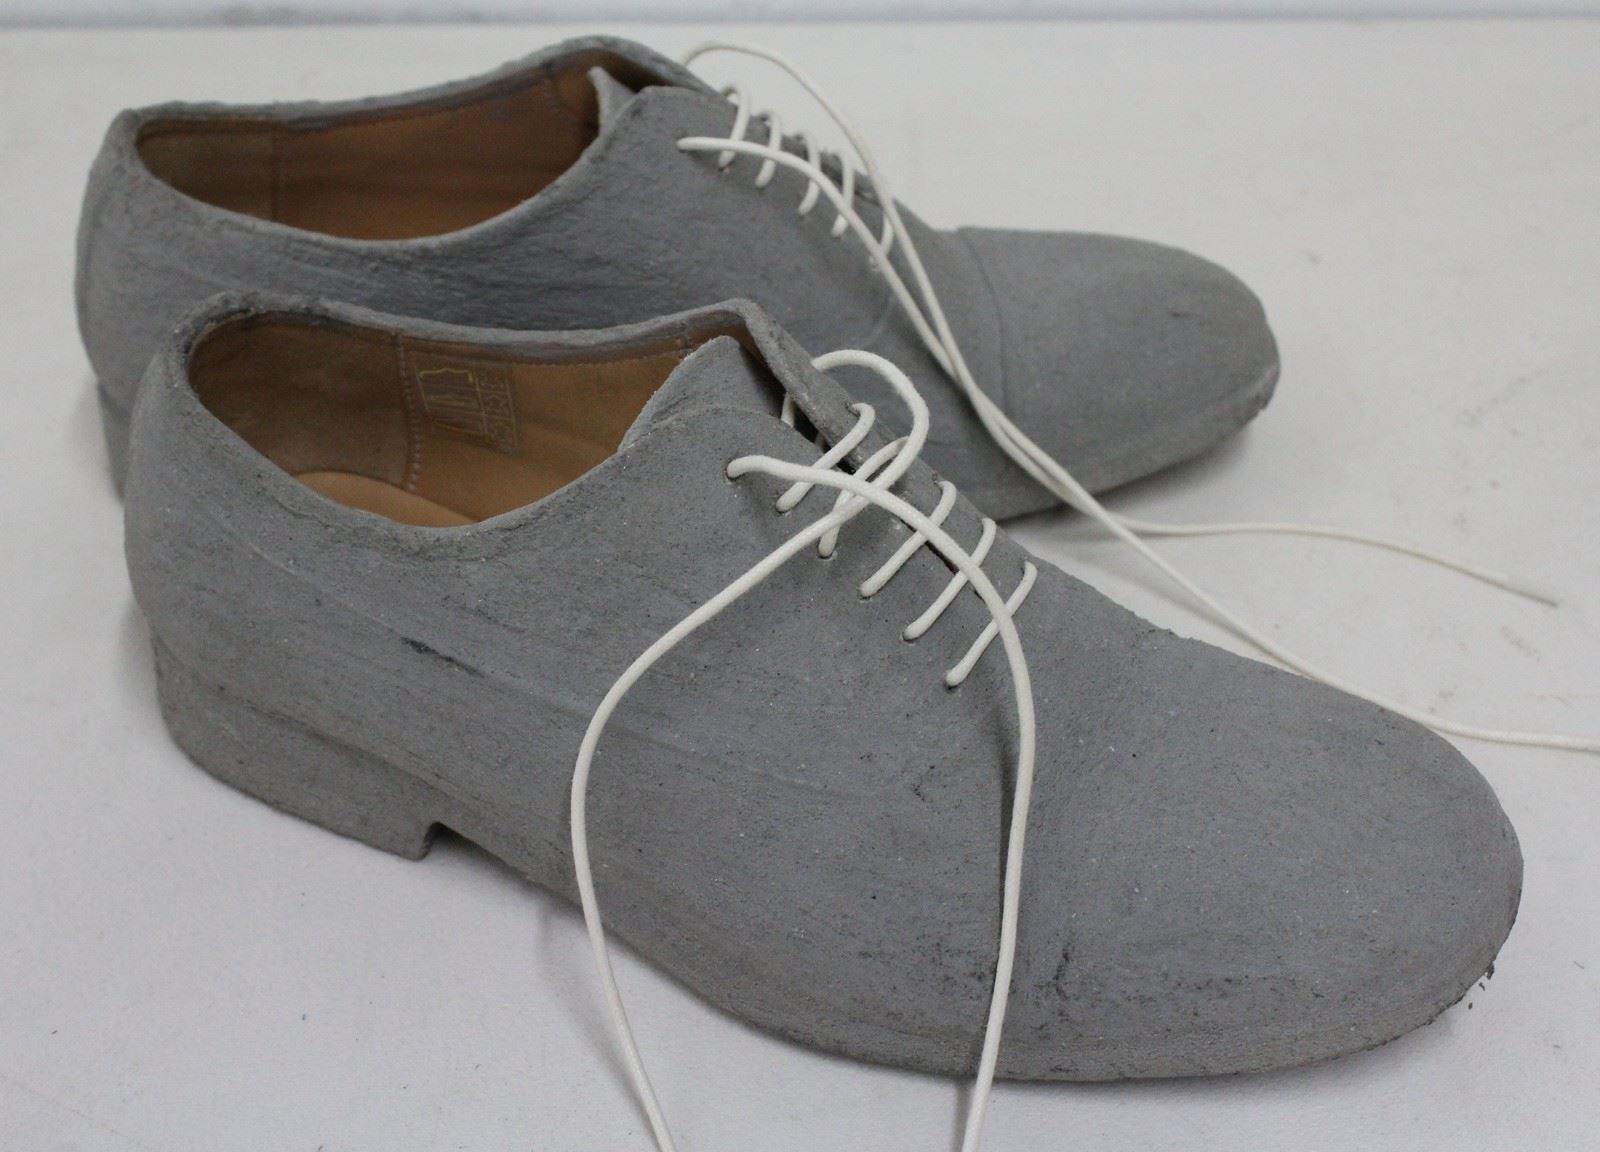 MAISON MARTIN MARGIELA Ladies Grey Cement Coated Leather Brogues EU35.5 UK3